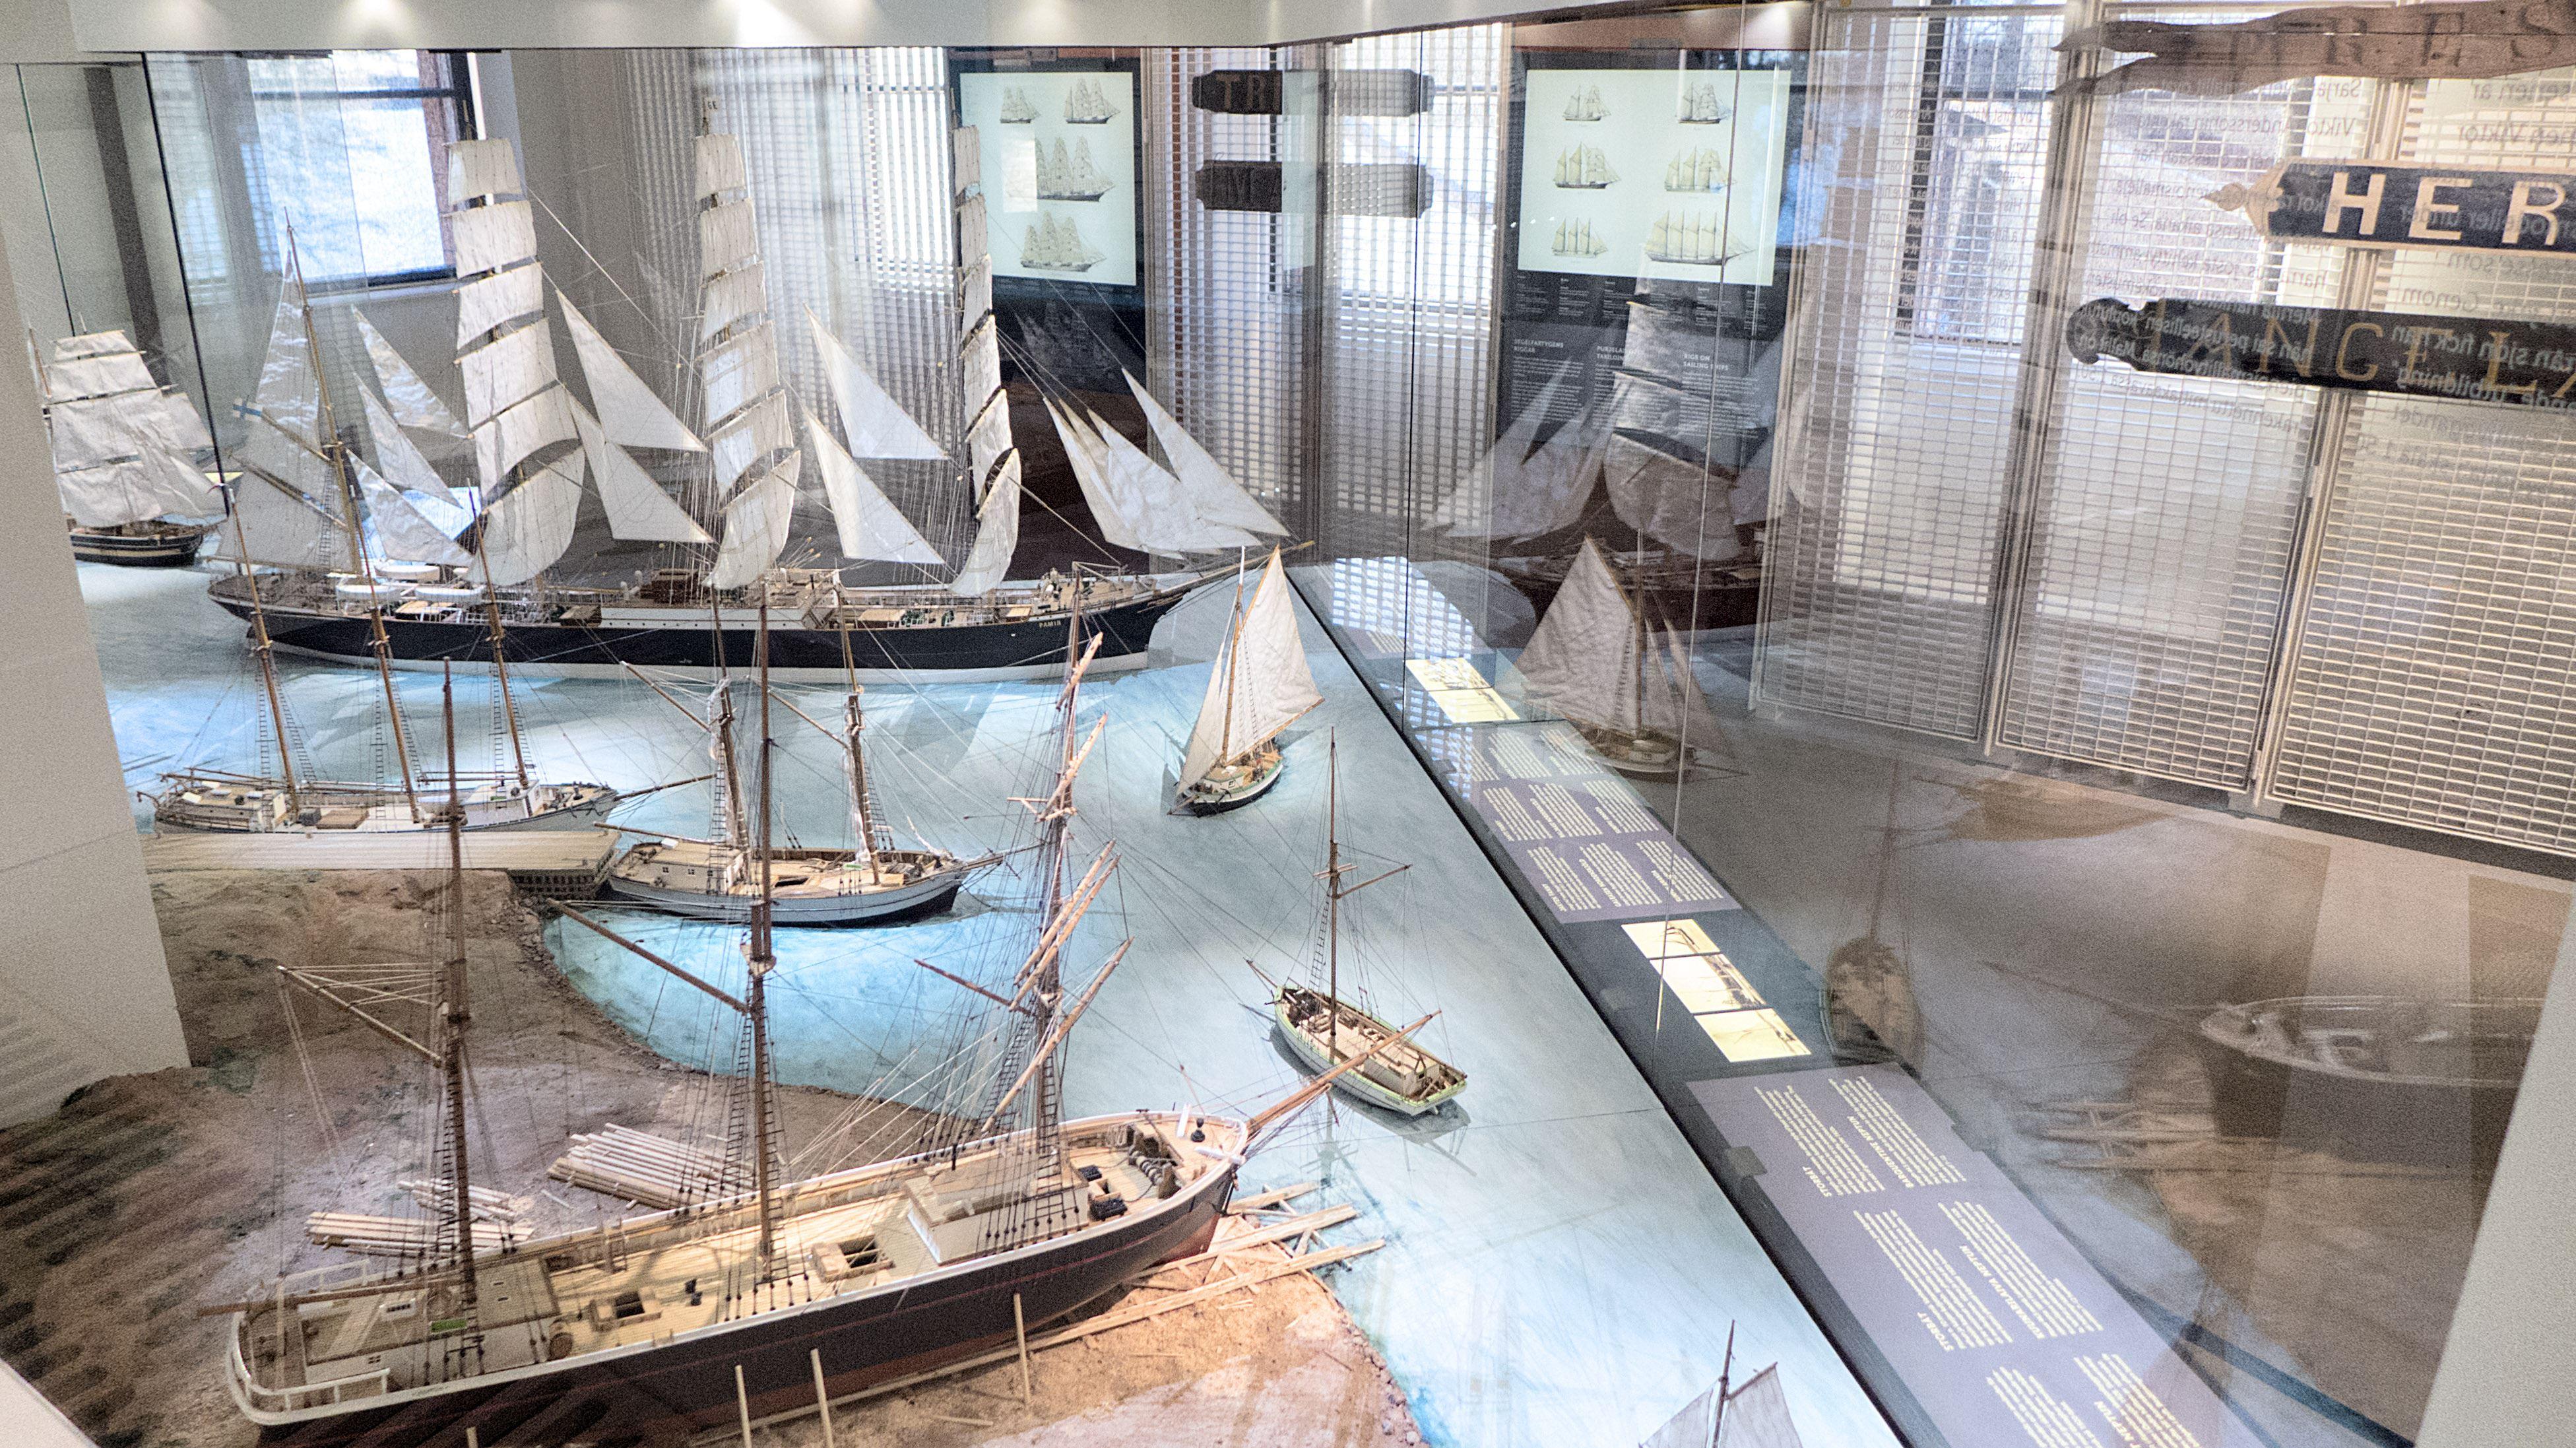 Entré till Ålands Sjöfartsmuseum